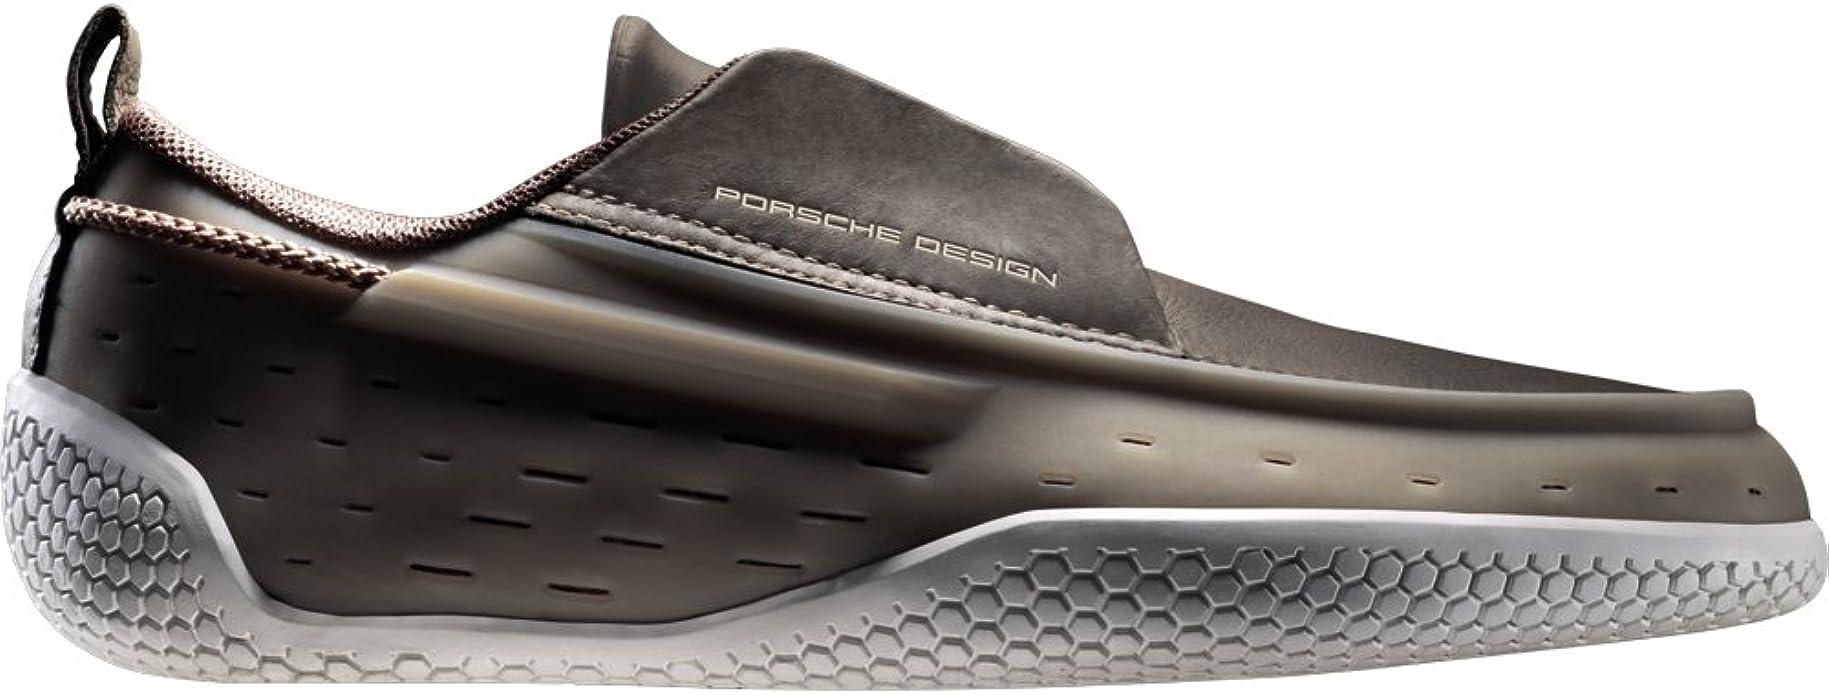 Amazon.com: adidas Porsche Design Wat Breez/Greyblend,greyblend ...